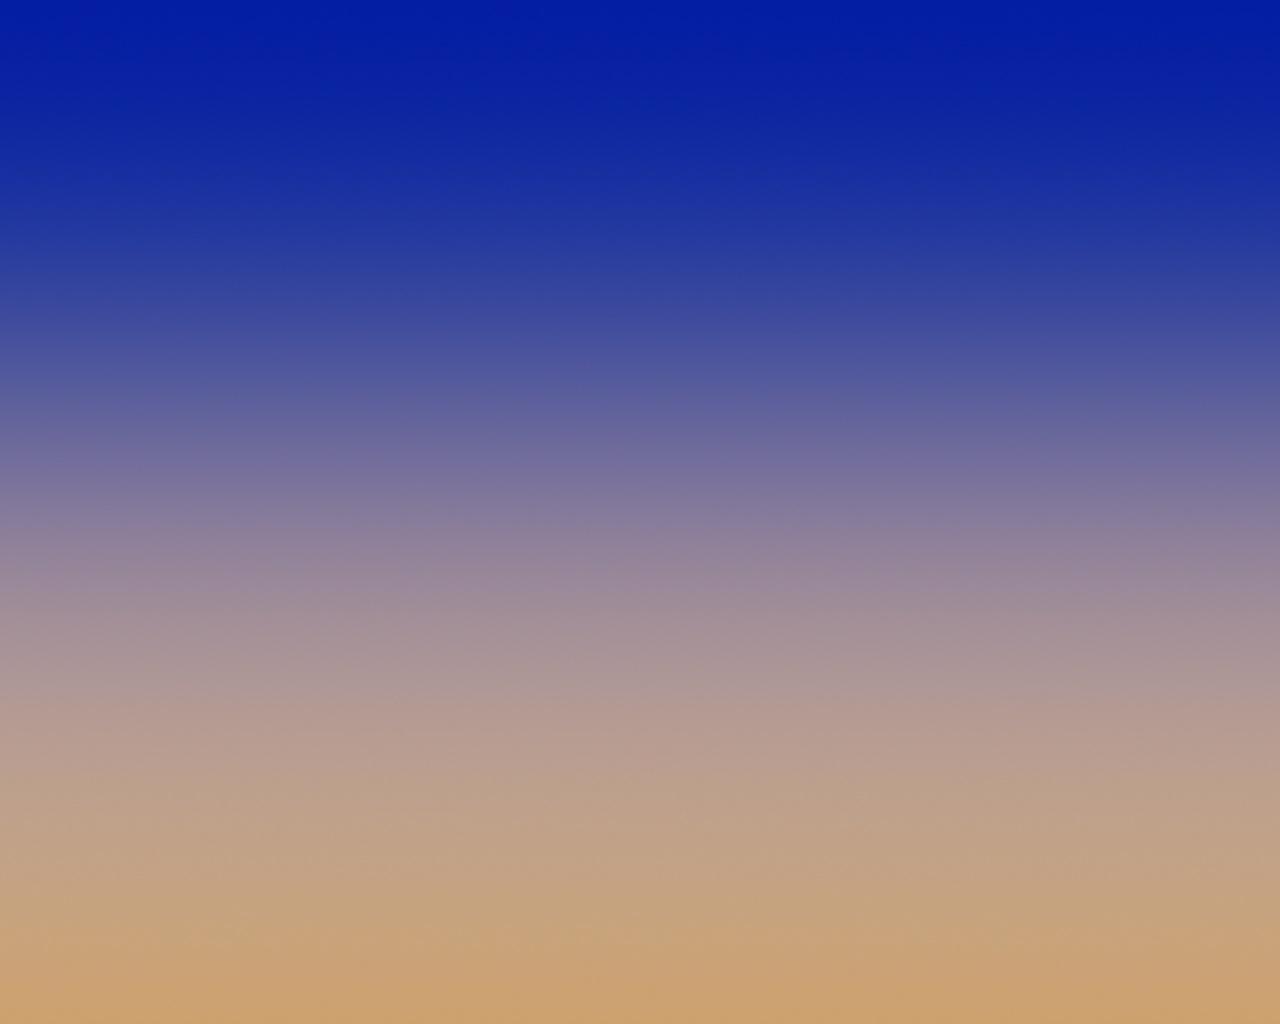 1280x1024 Samung Galaxy Note 9 Original